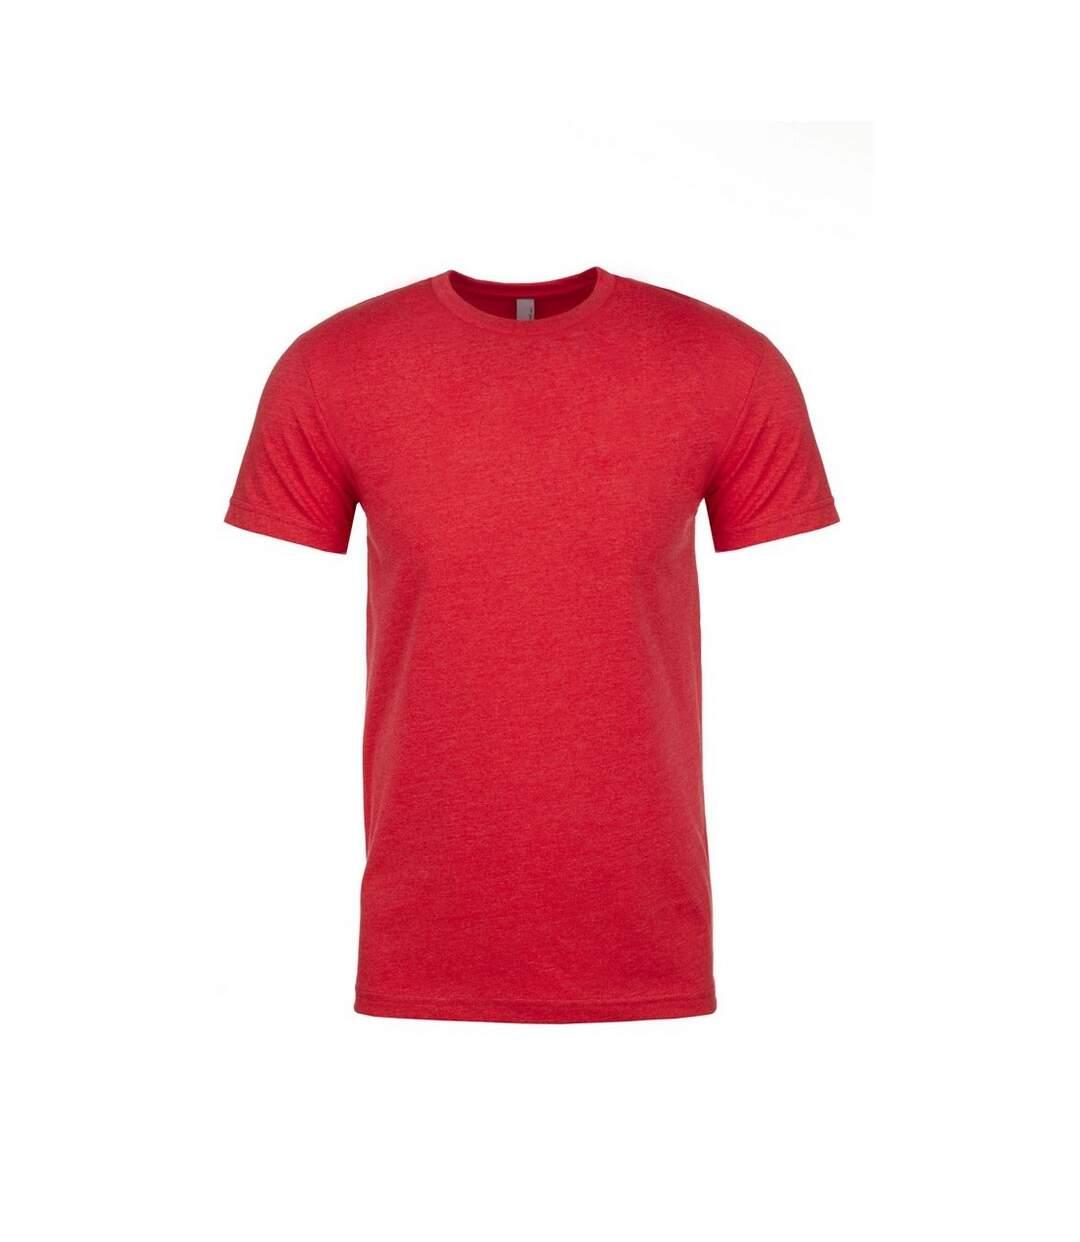 Next Level Adults Unisex CVC Crew Neck T-Shirt (Red) - UTPC3480